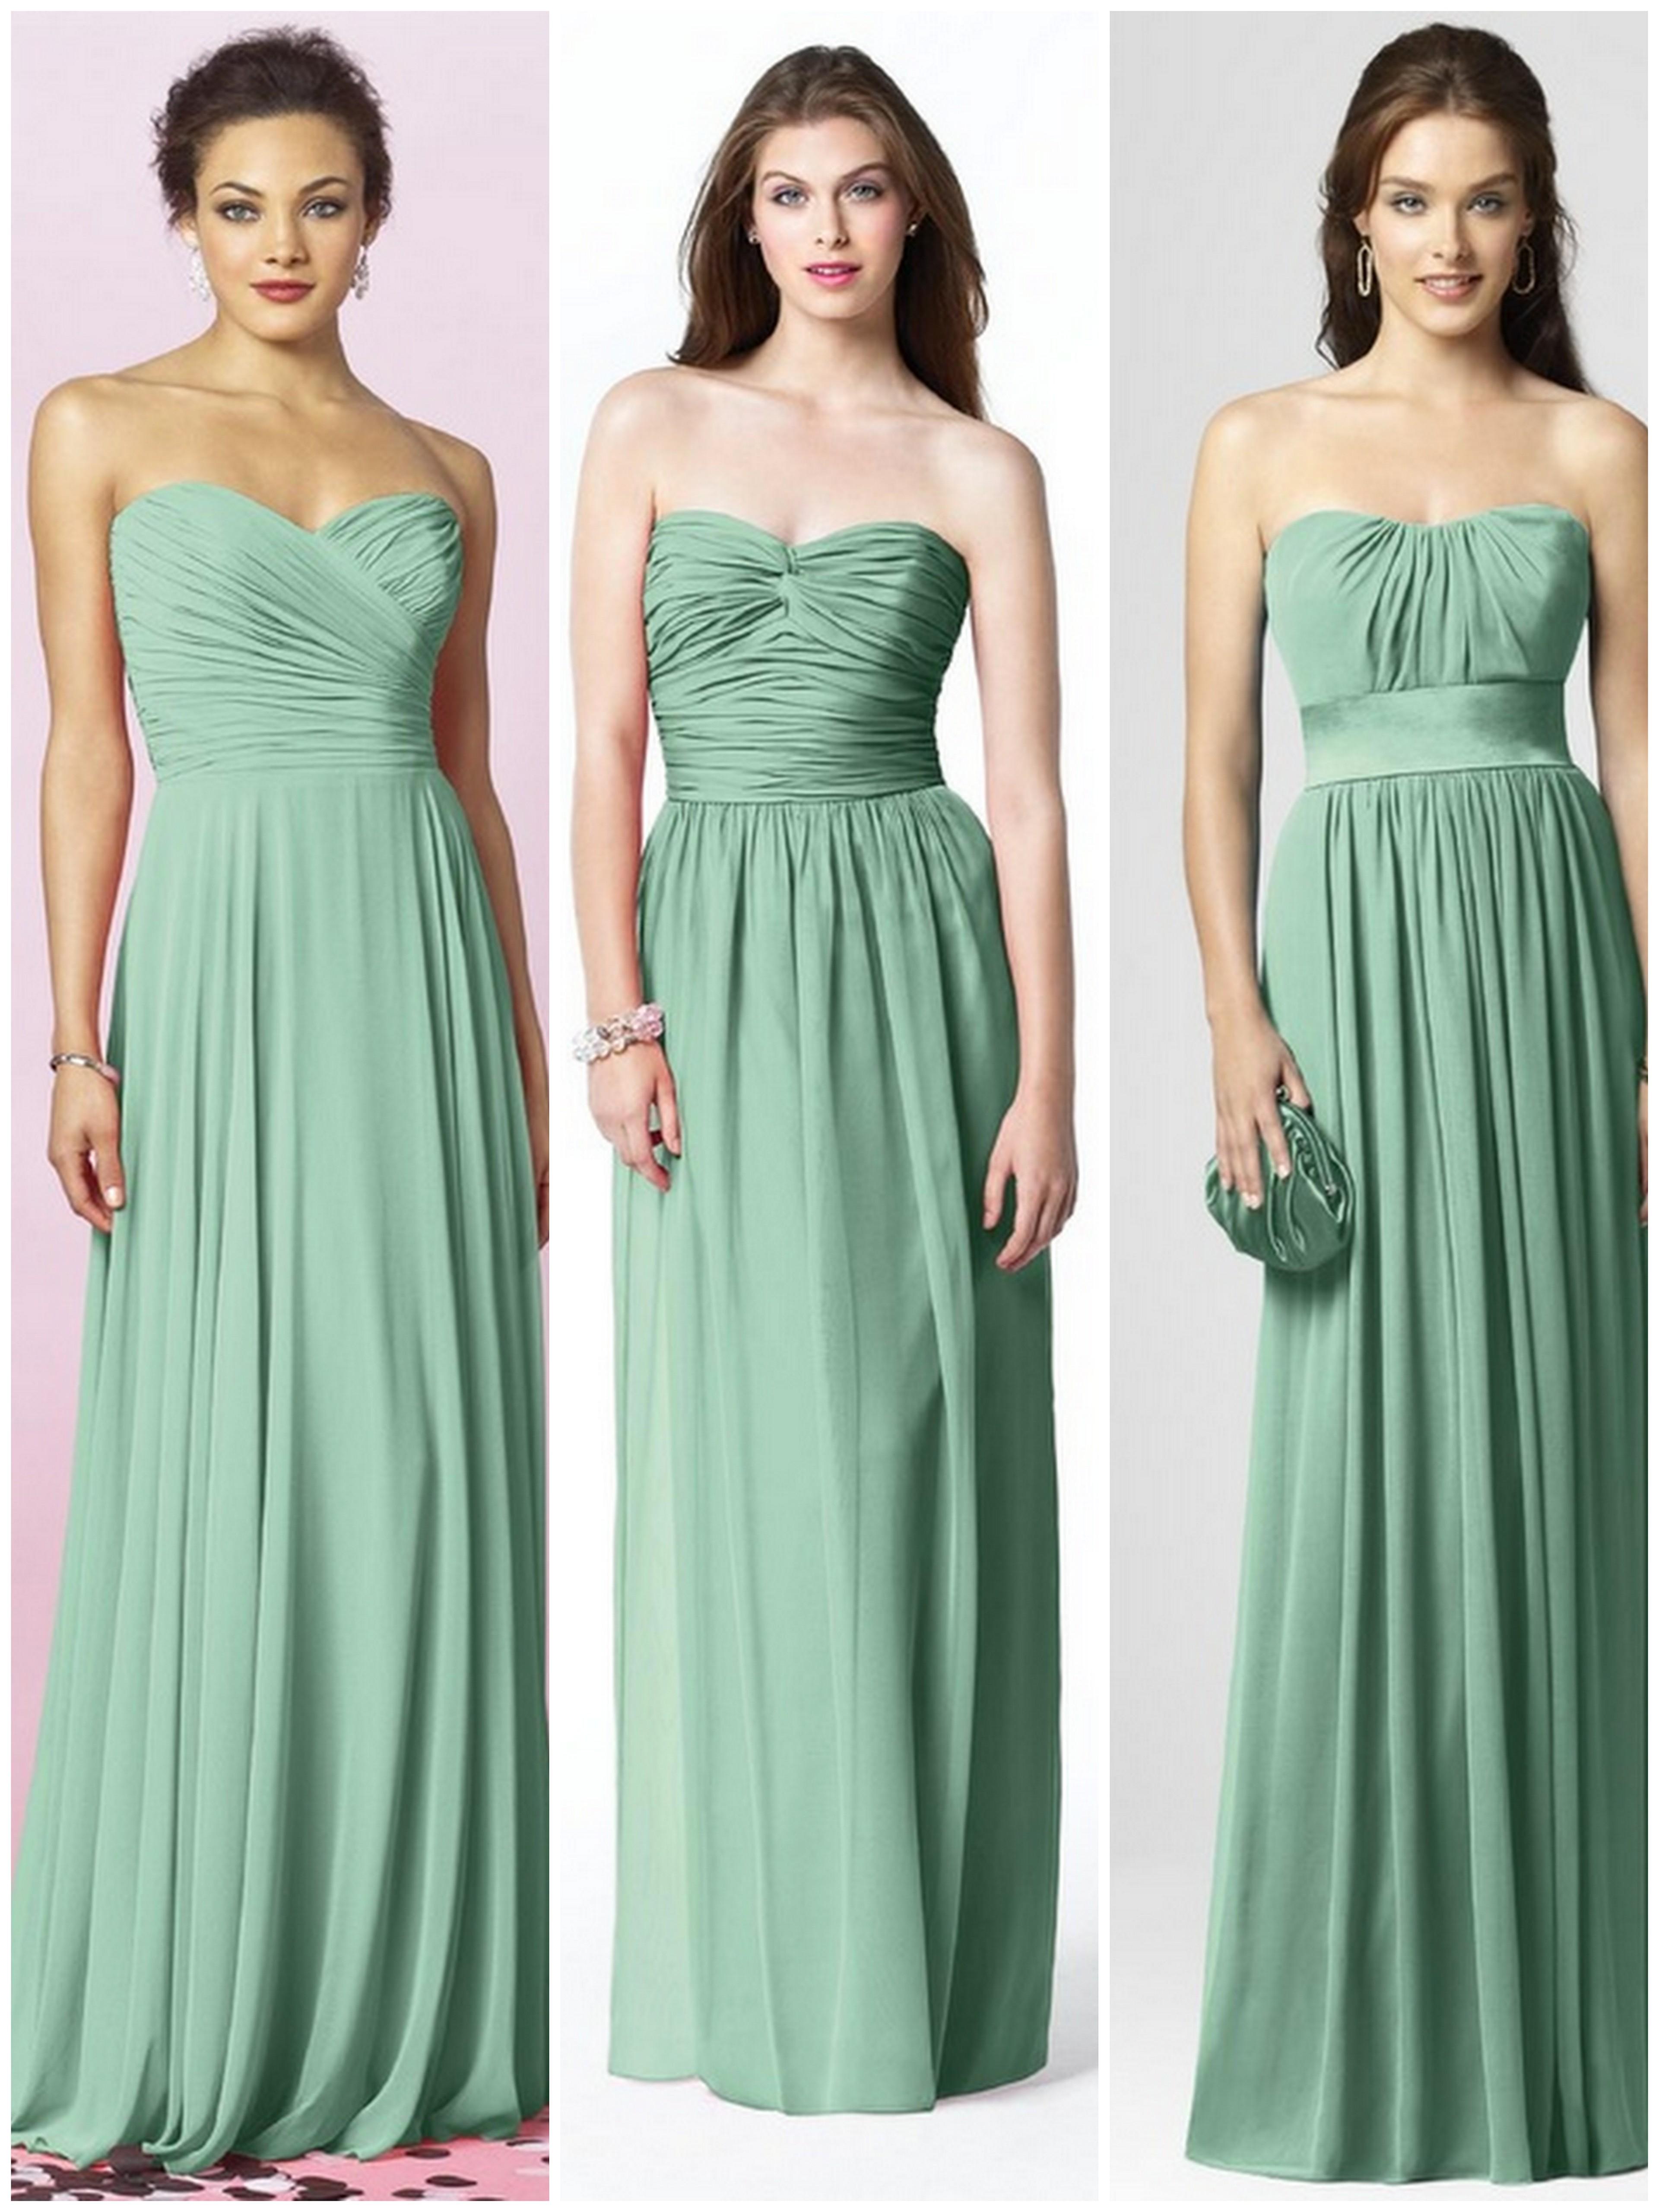 Green & Blue Bridesmaid Dresses